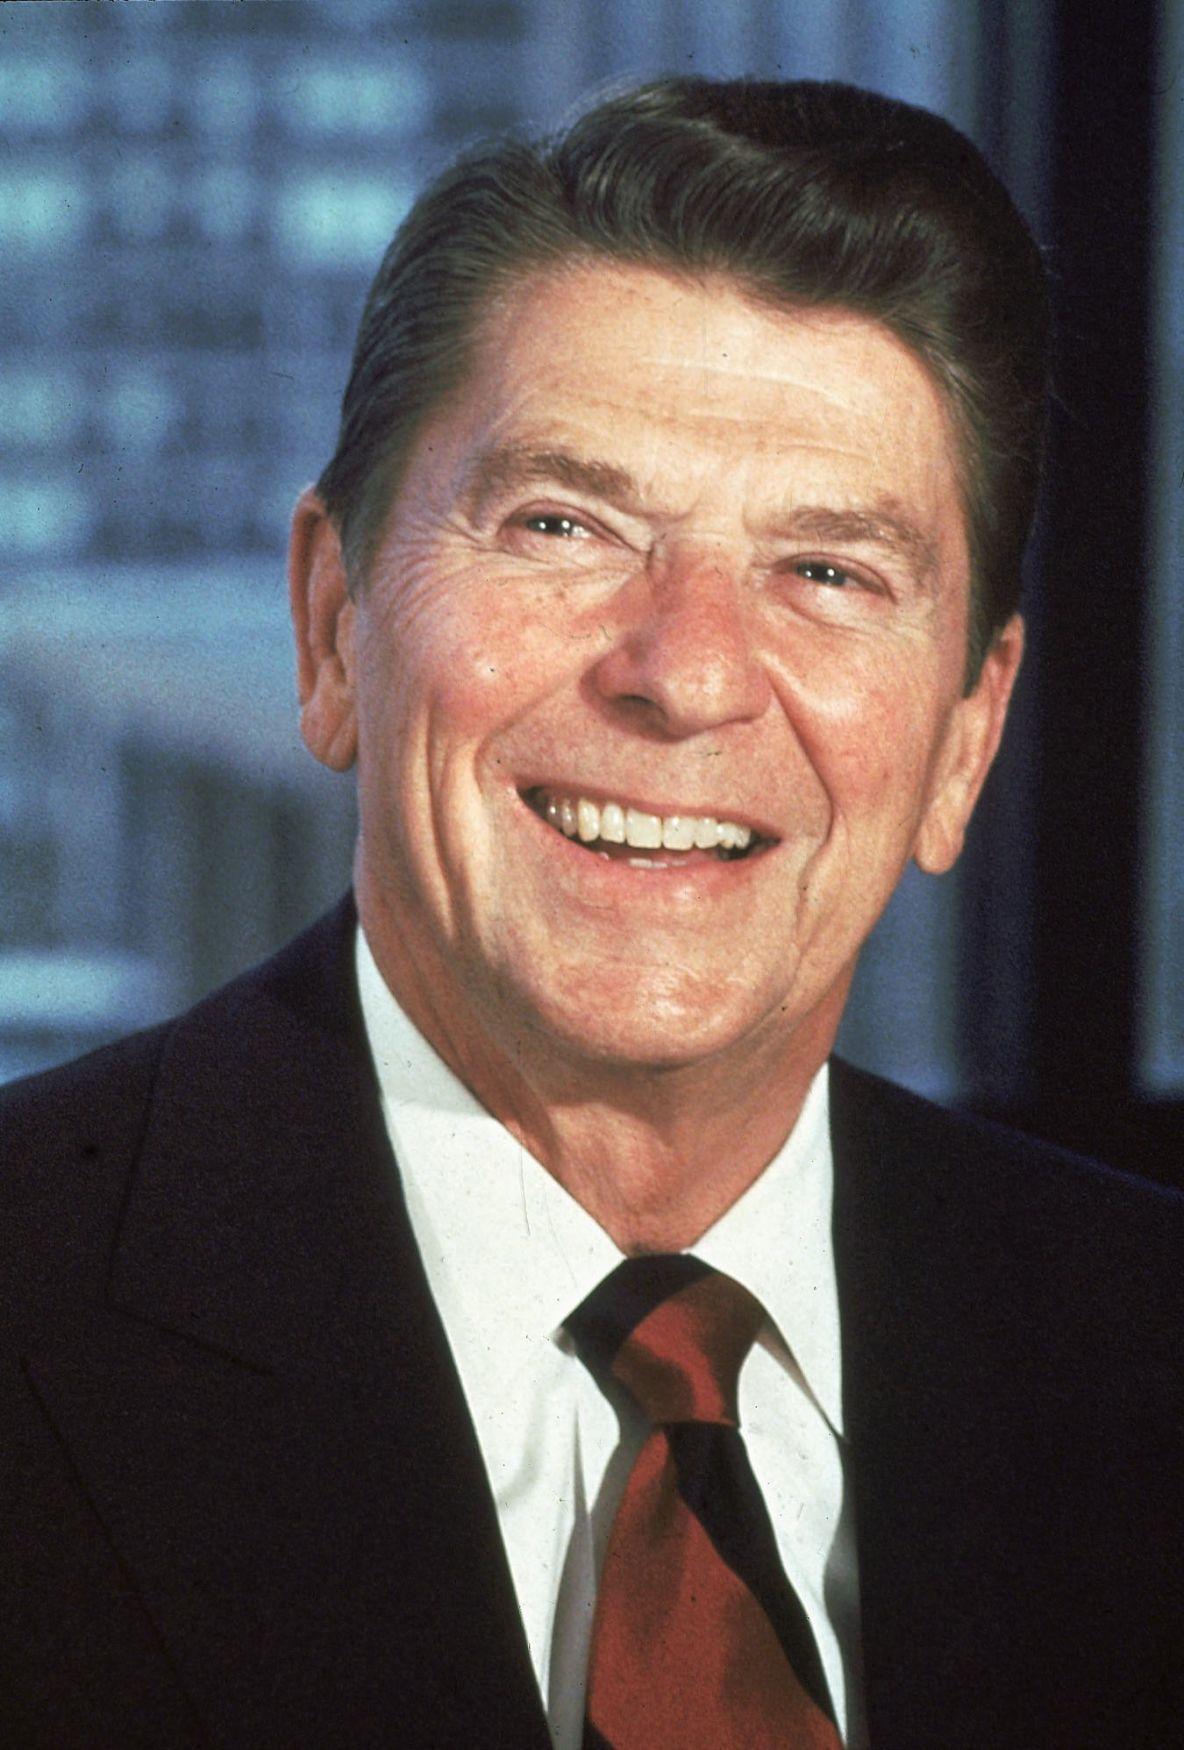 Dark Trump vs. sunny Reagan